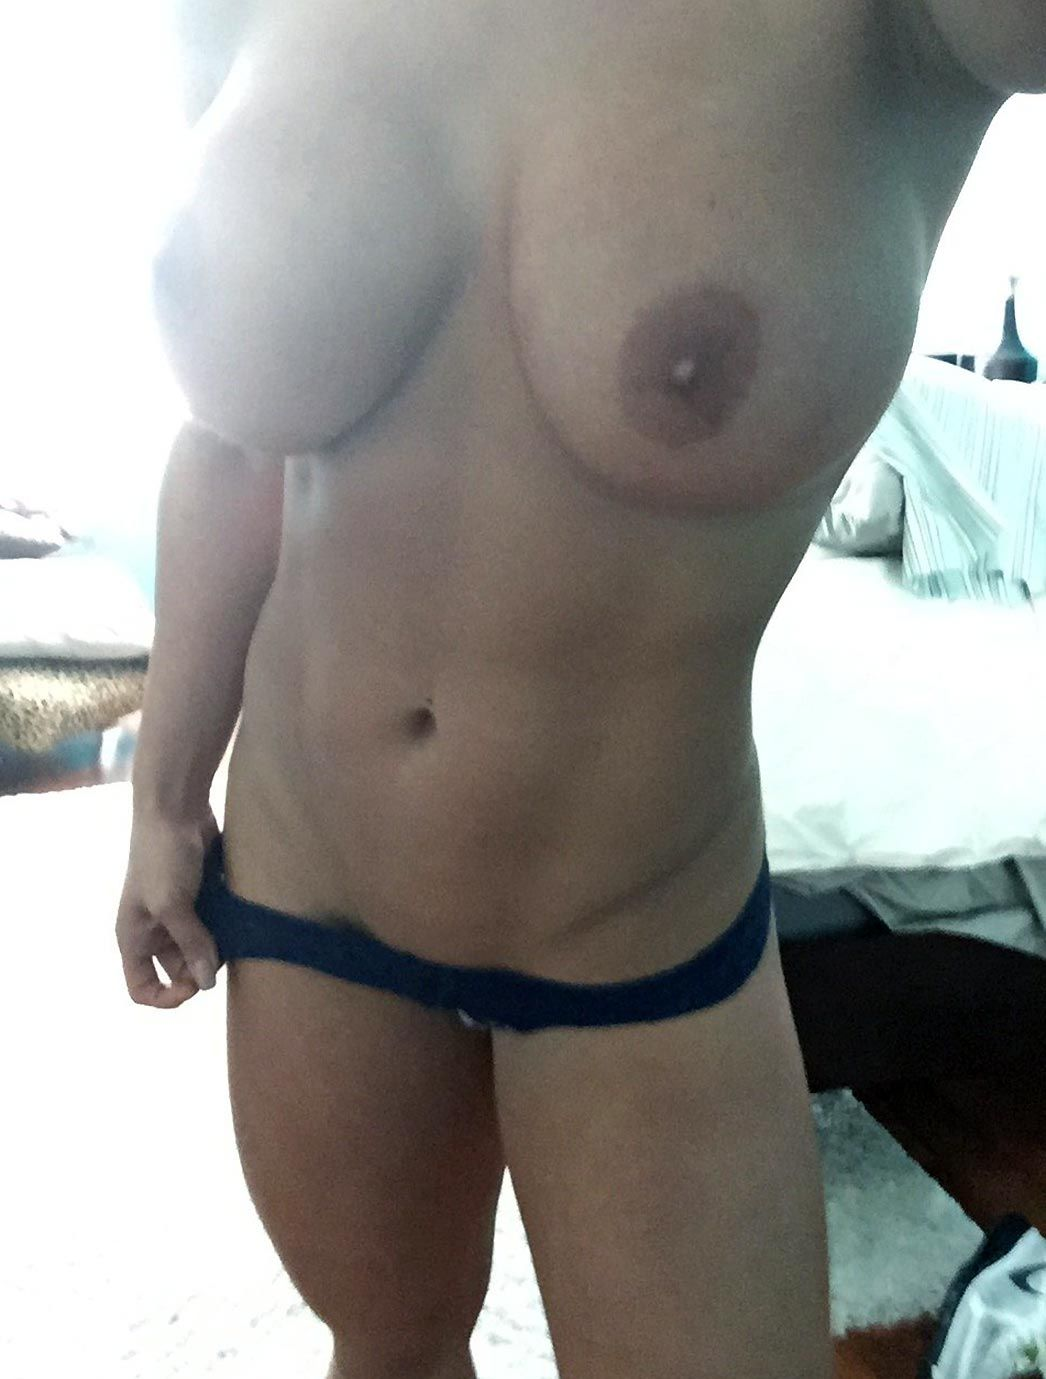 Celeste Bonin Nude Leaked The Fappening & Sexy 0187